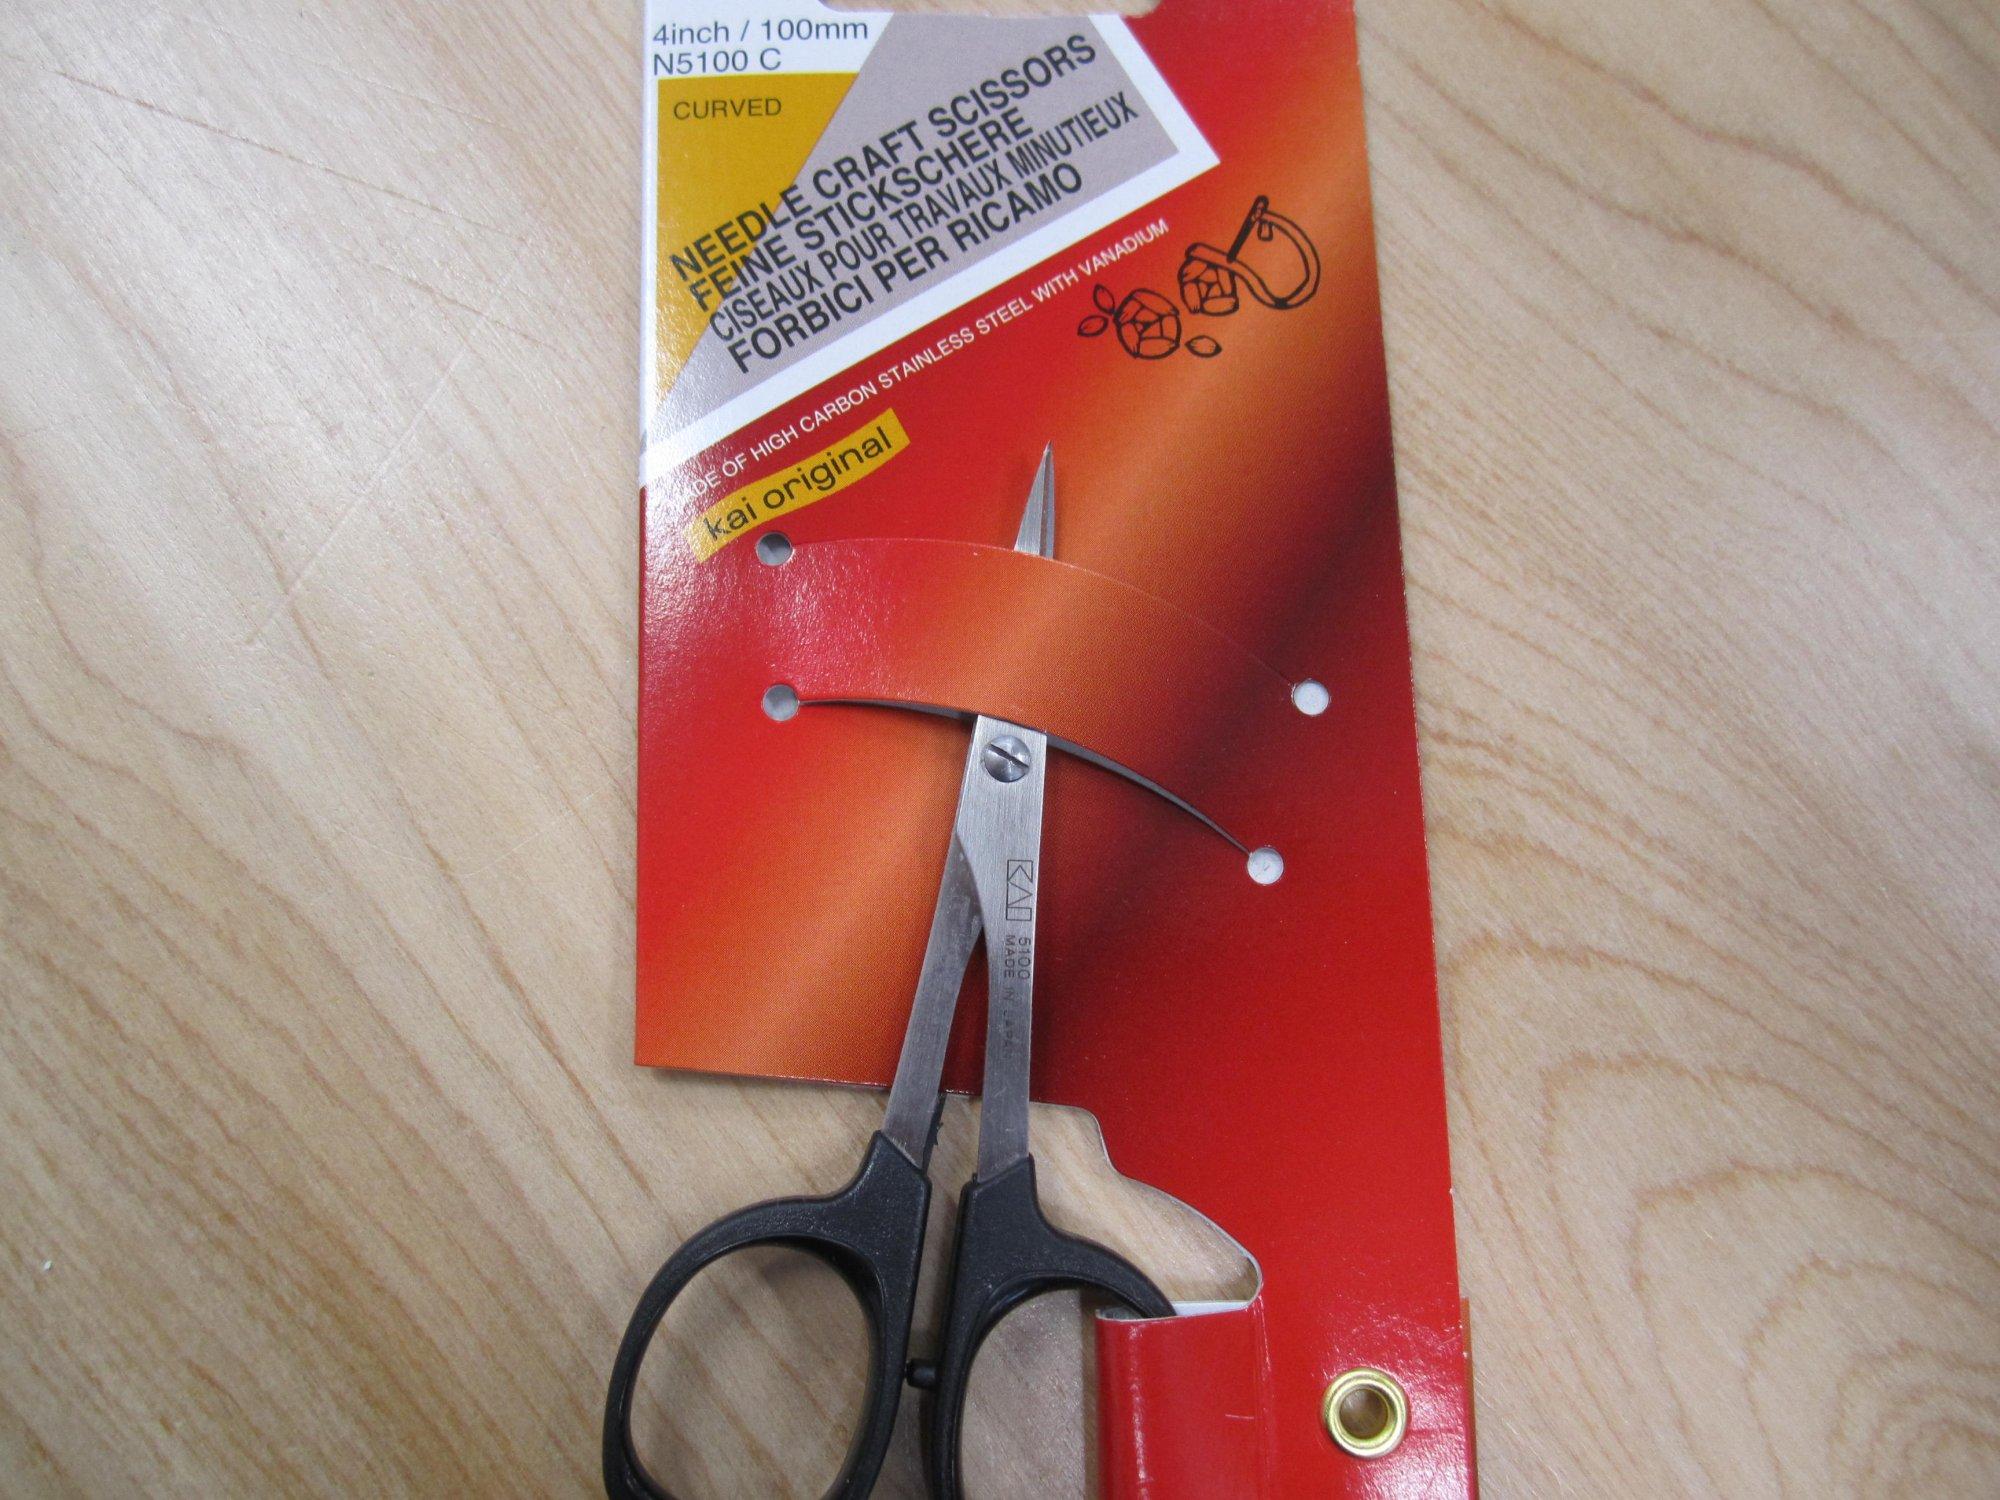 Kai needle craft scissors